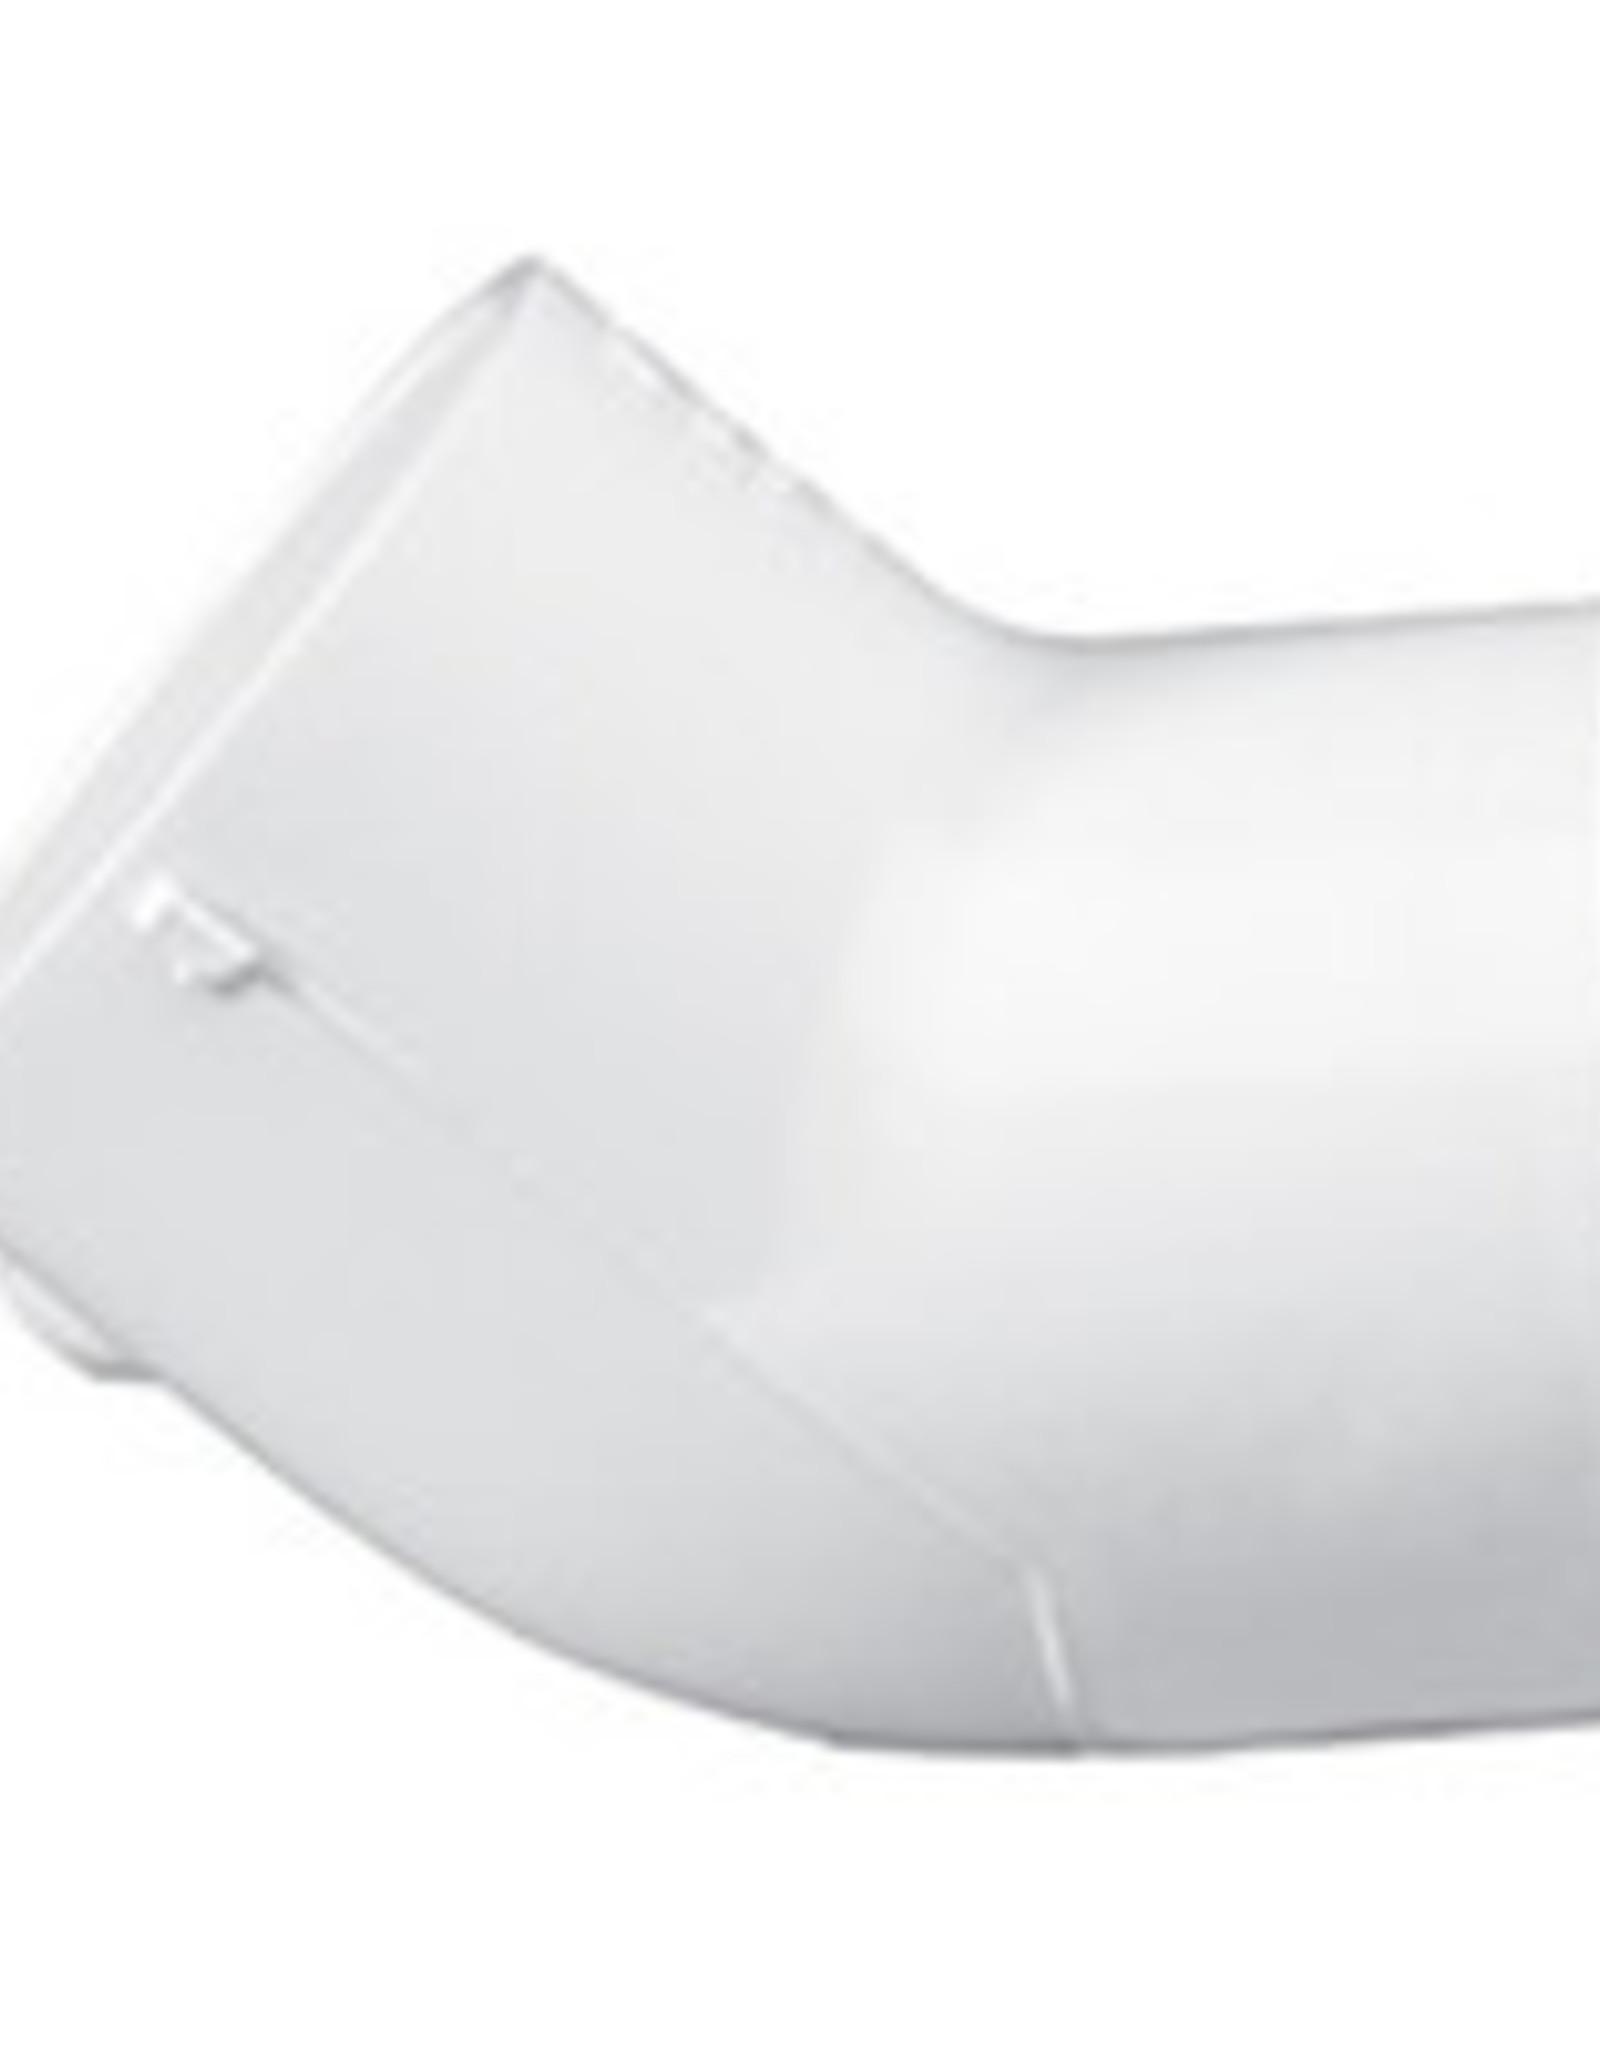 "Lasco Fittings PVC 1.5"" 45 Degree Elbow Slip x Slip SCH 40"